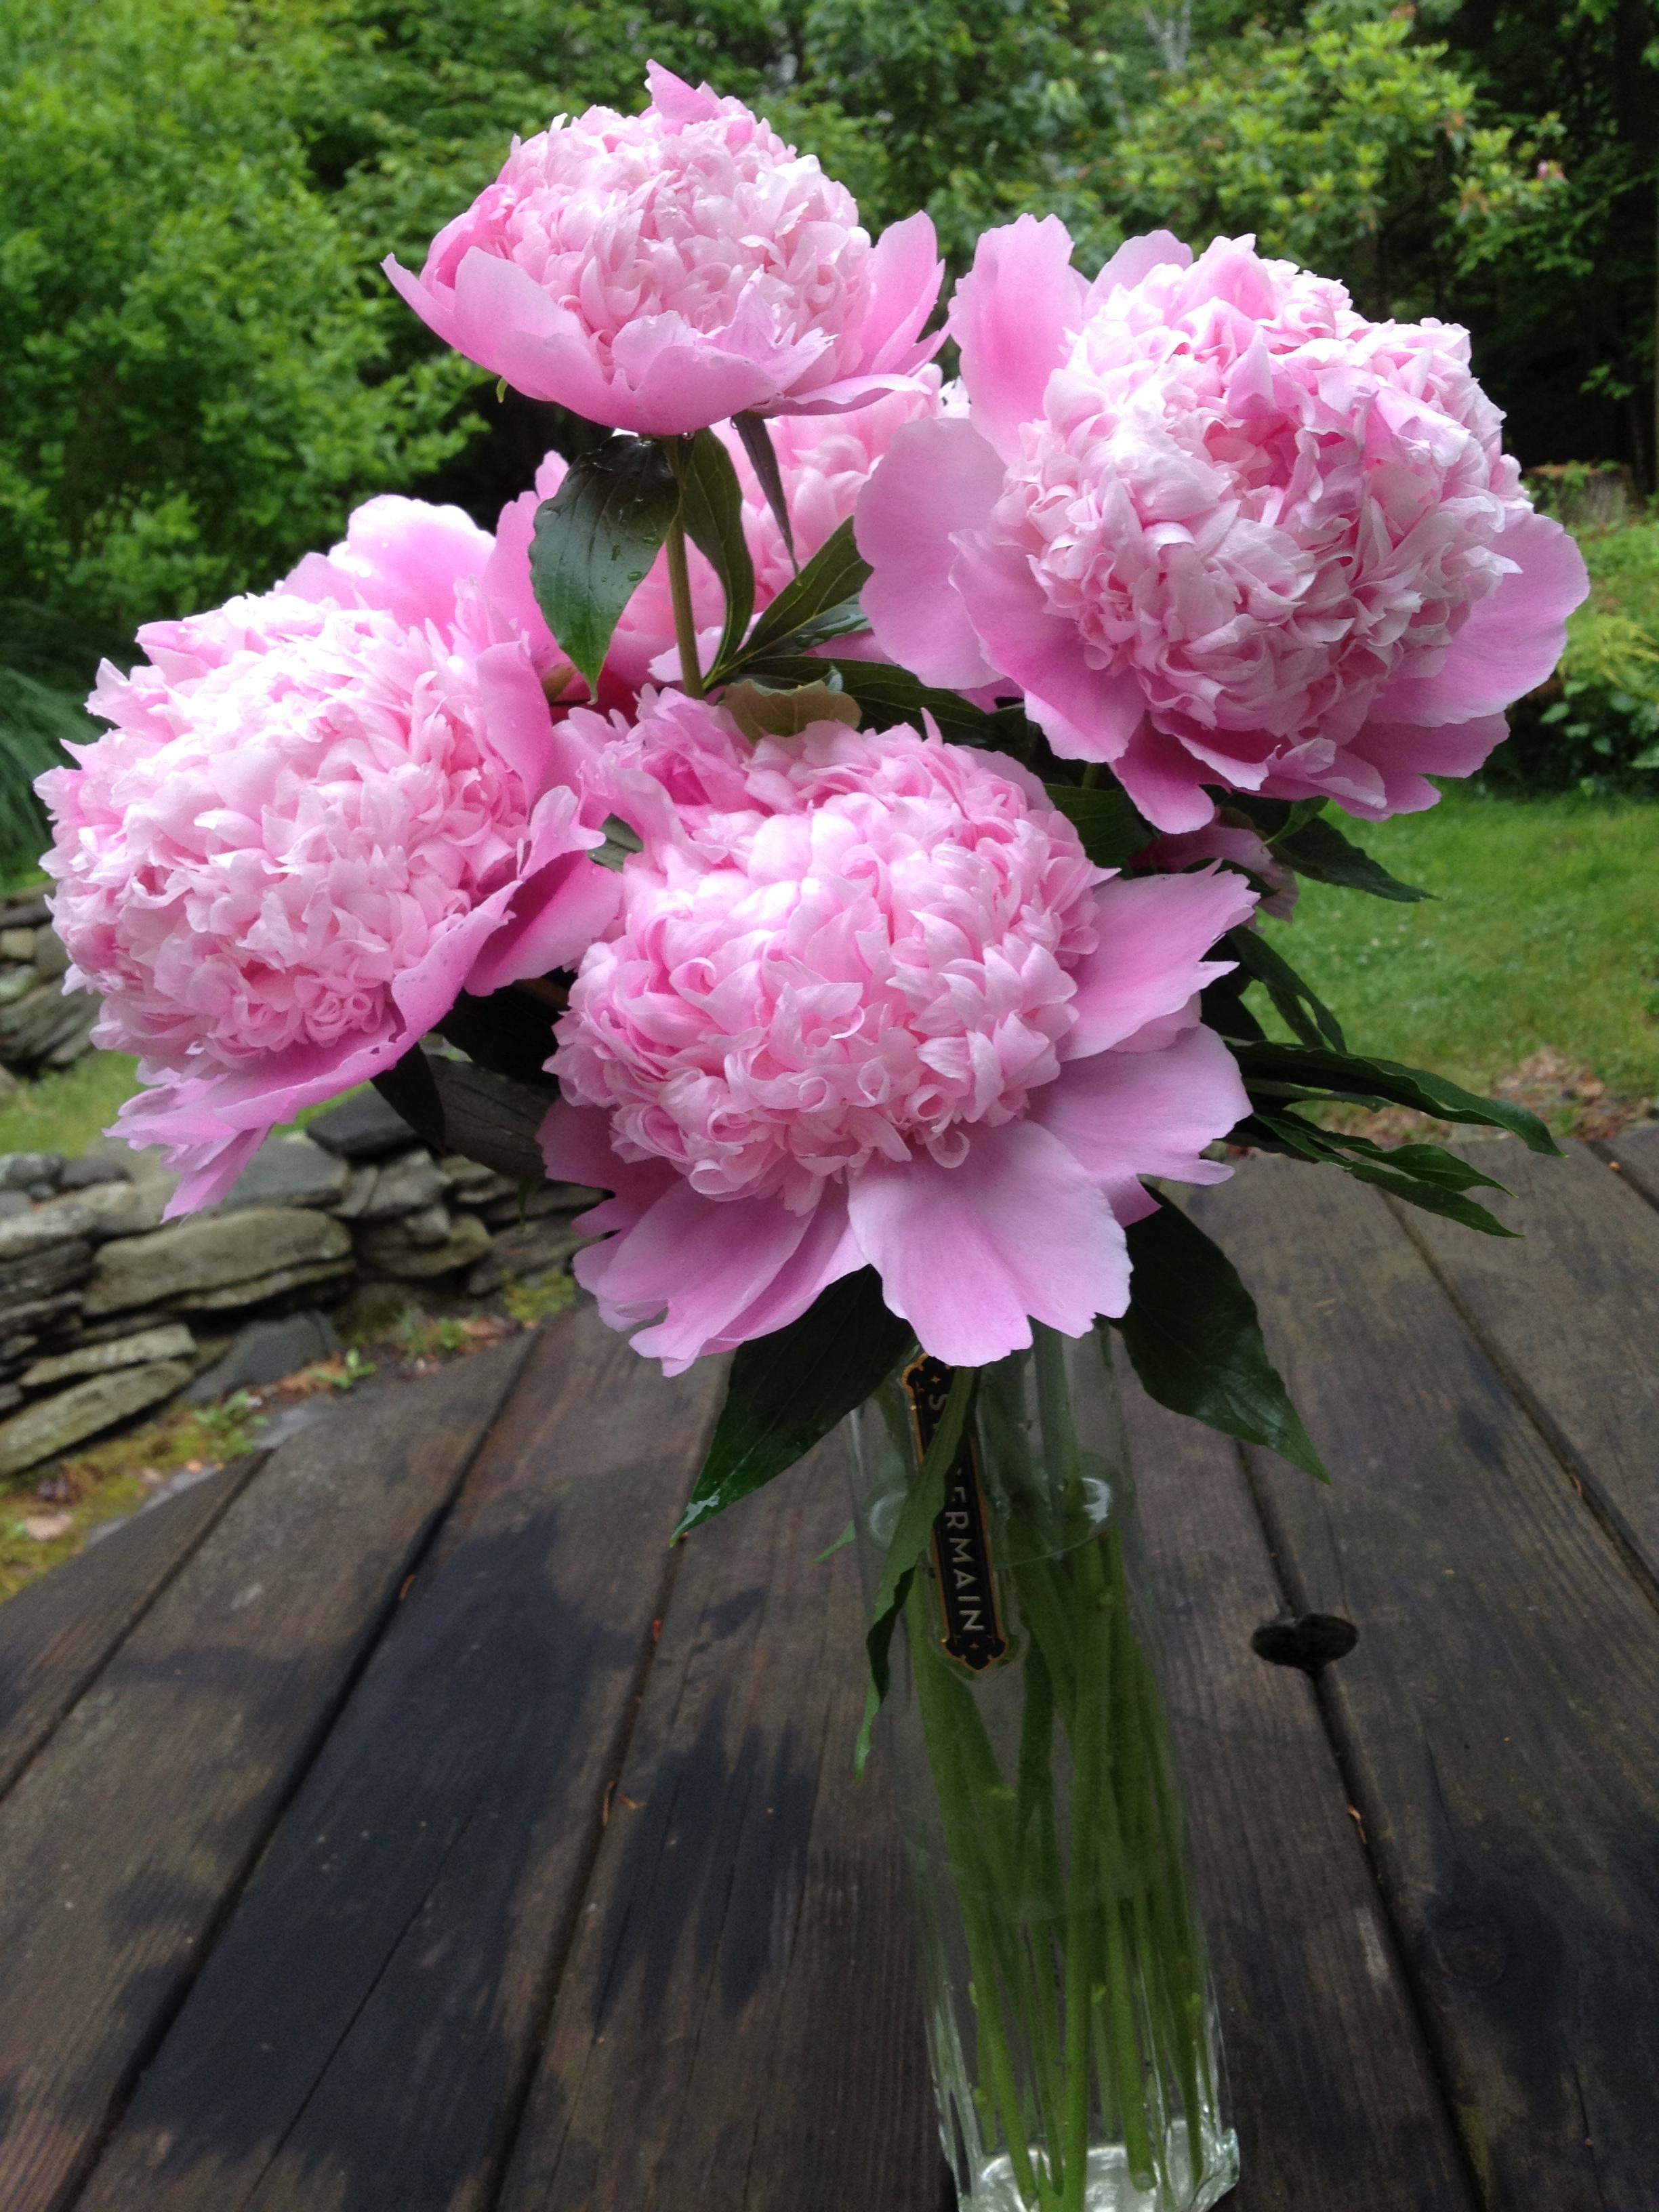 Grew these in my garden!